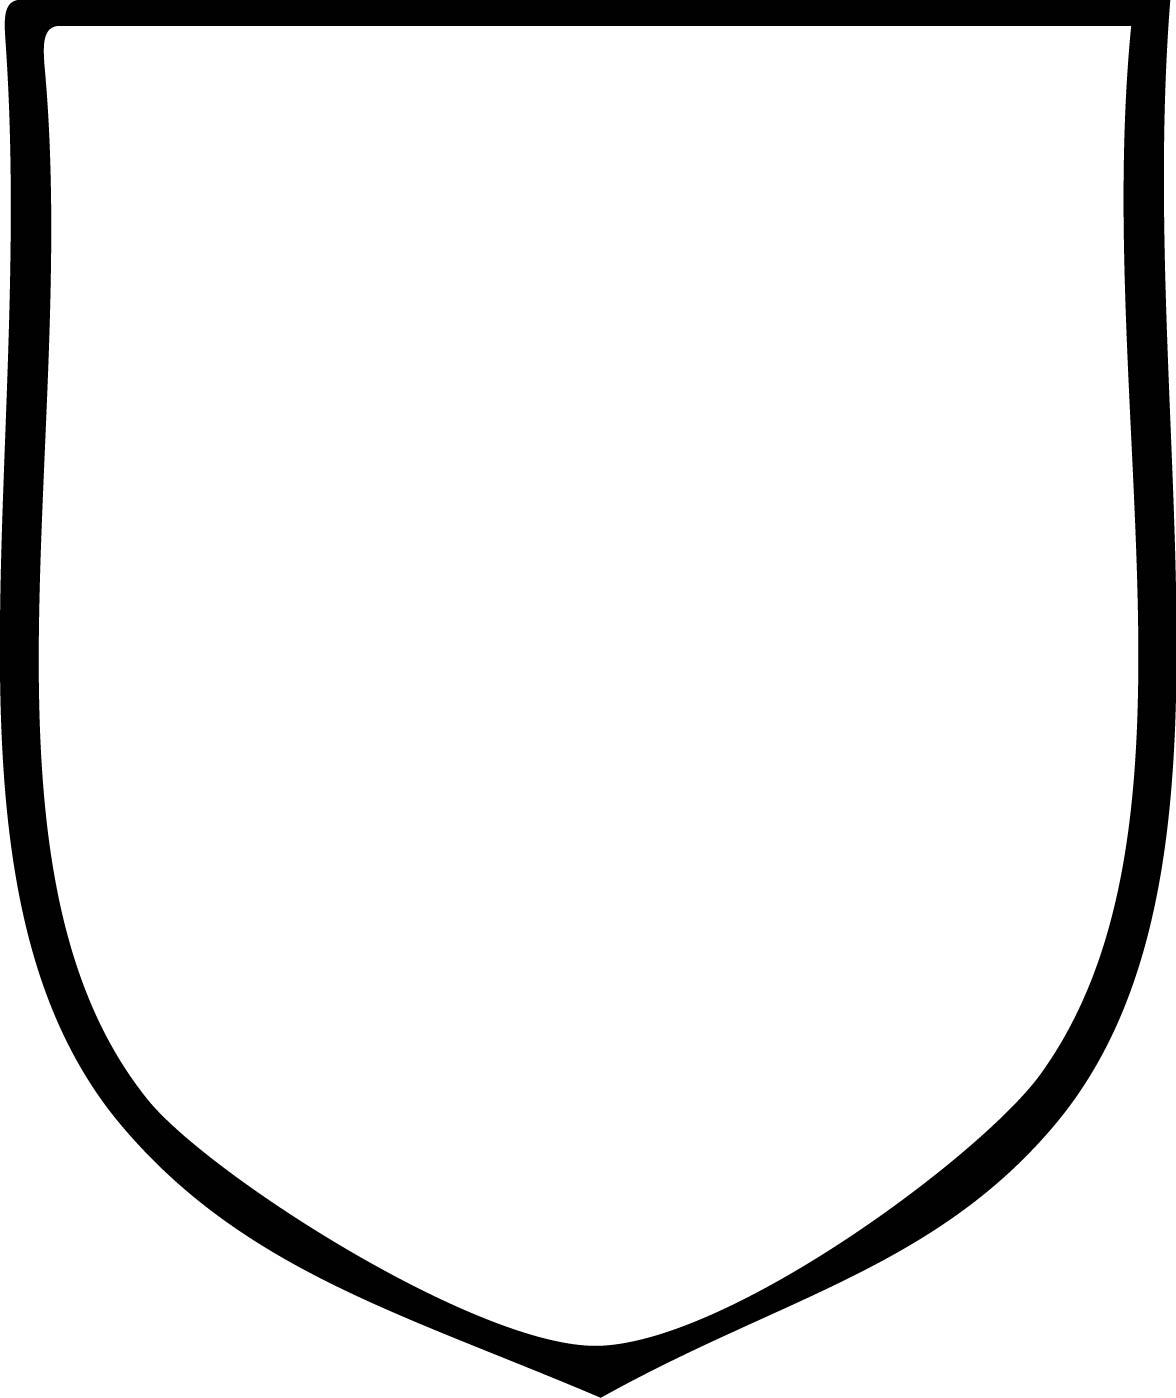 1176x1398 Heraldic Shields Clip Art (31+)